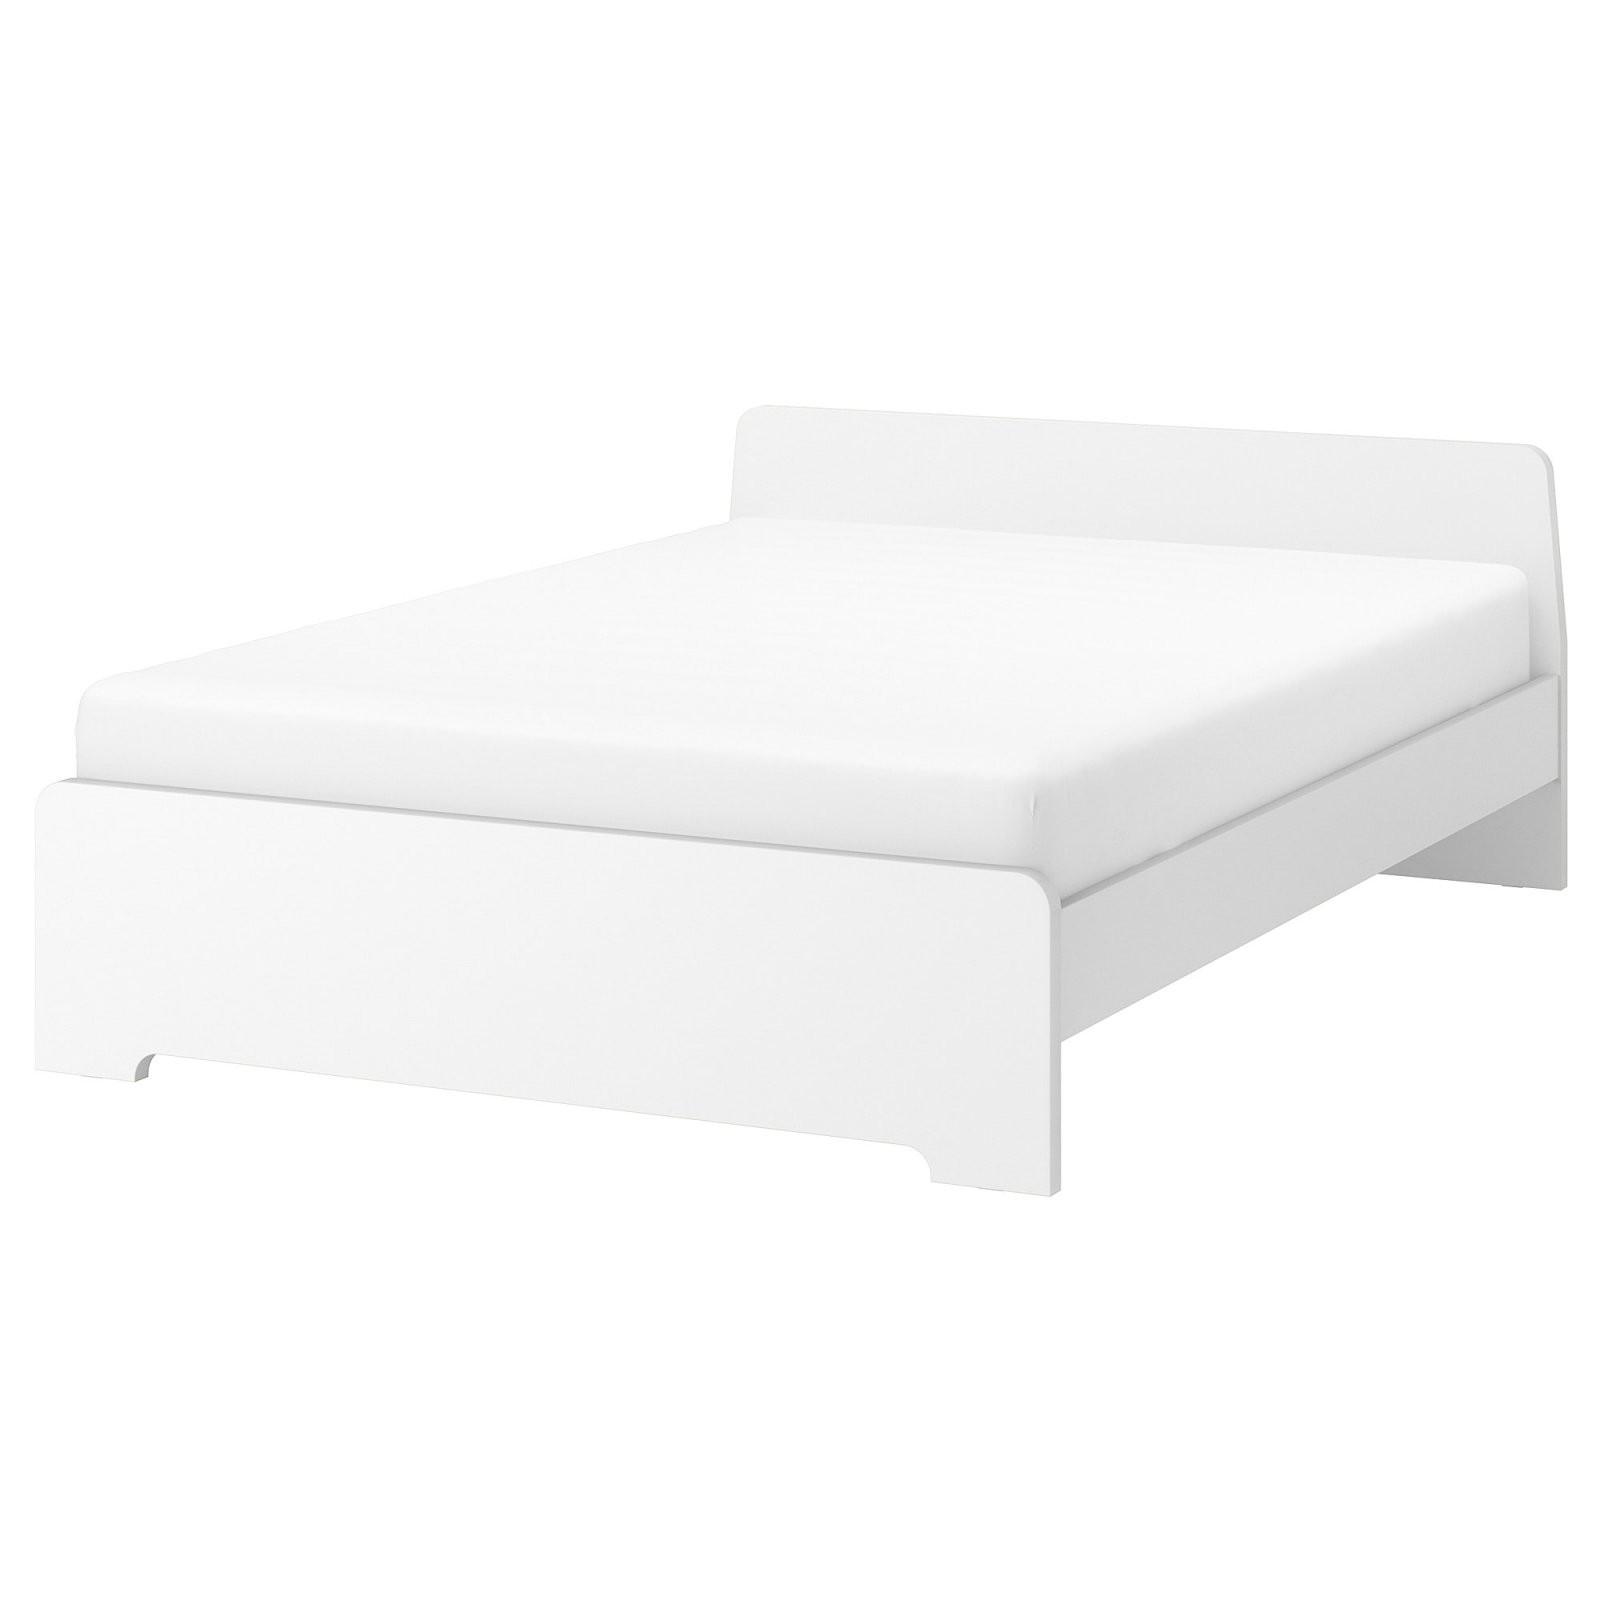 Askvoll Bettgestell  Weiß  Ikea von Metallbett 90X200 Weiß Ikea Bild